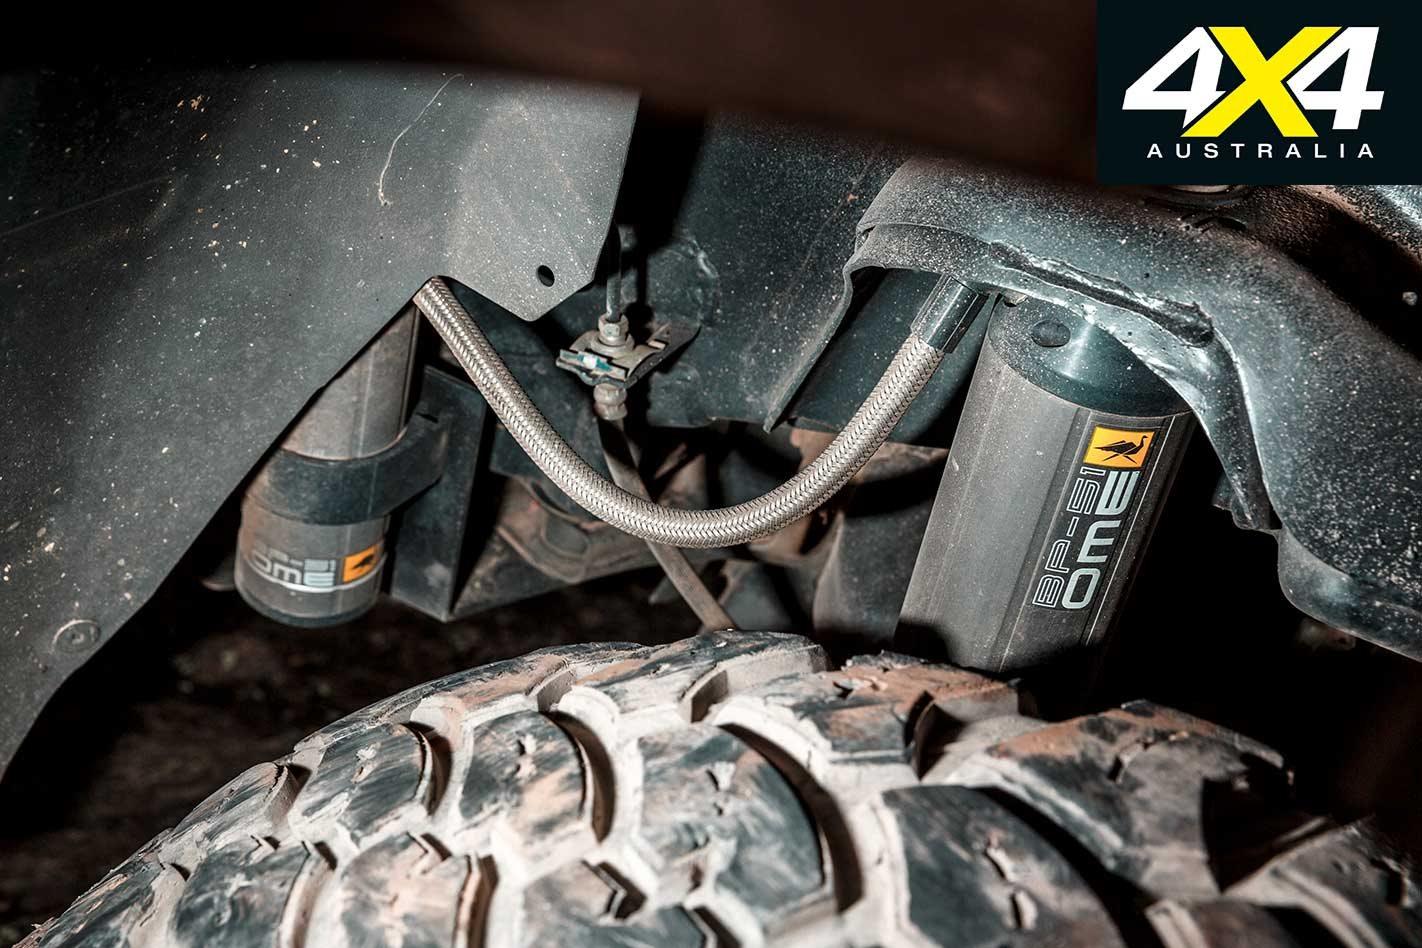 315 70r17 In Inches >> Custom Nissan Y62 Patrol dual-cab ute review